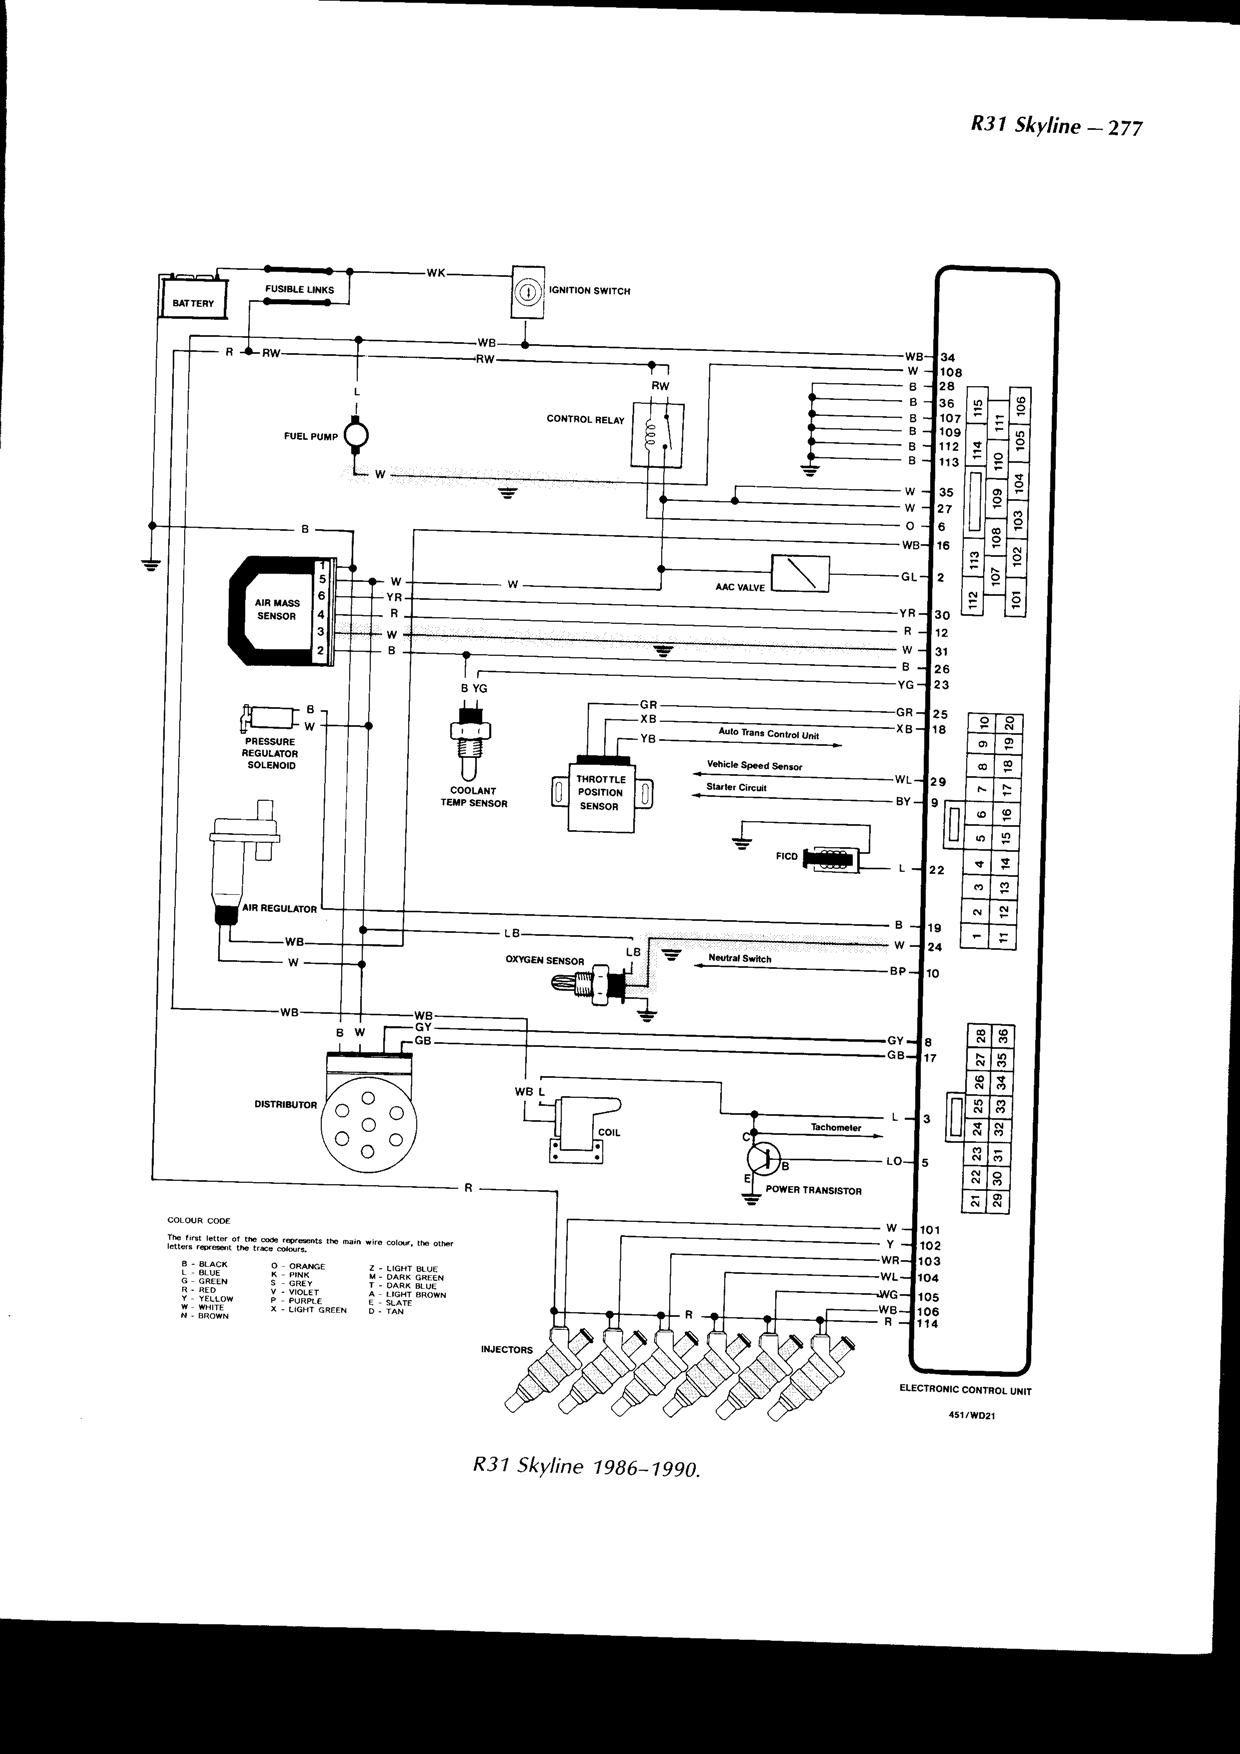 Fabulous Nissan 1400 Wiring Diagram Pdf Wiring Diagram G9 Wiring Cloud Onicaalyptbenolwigegmohammedshrineorg